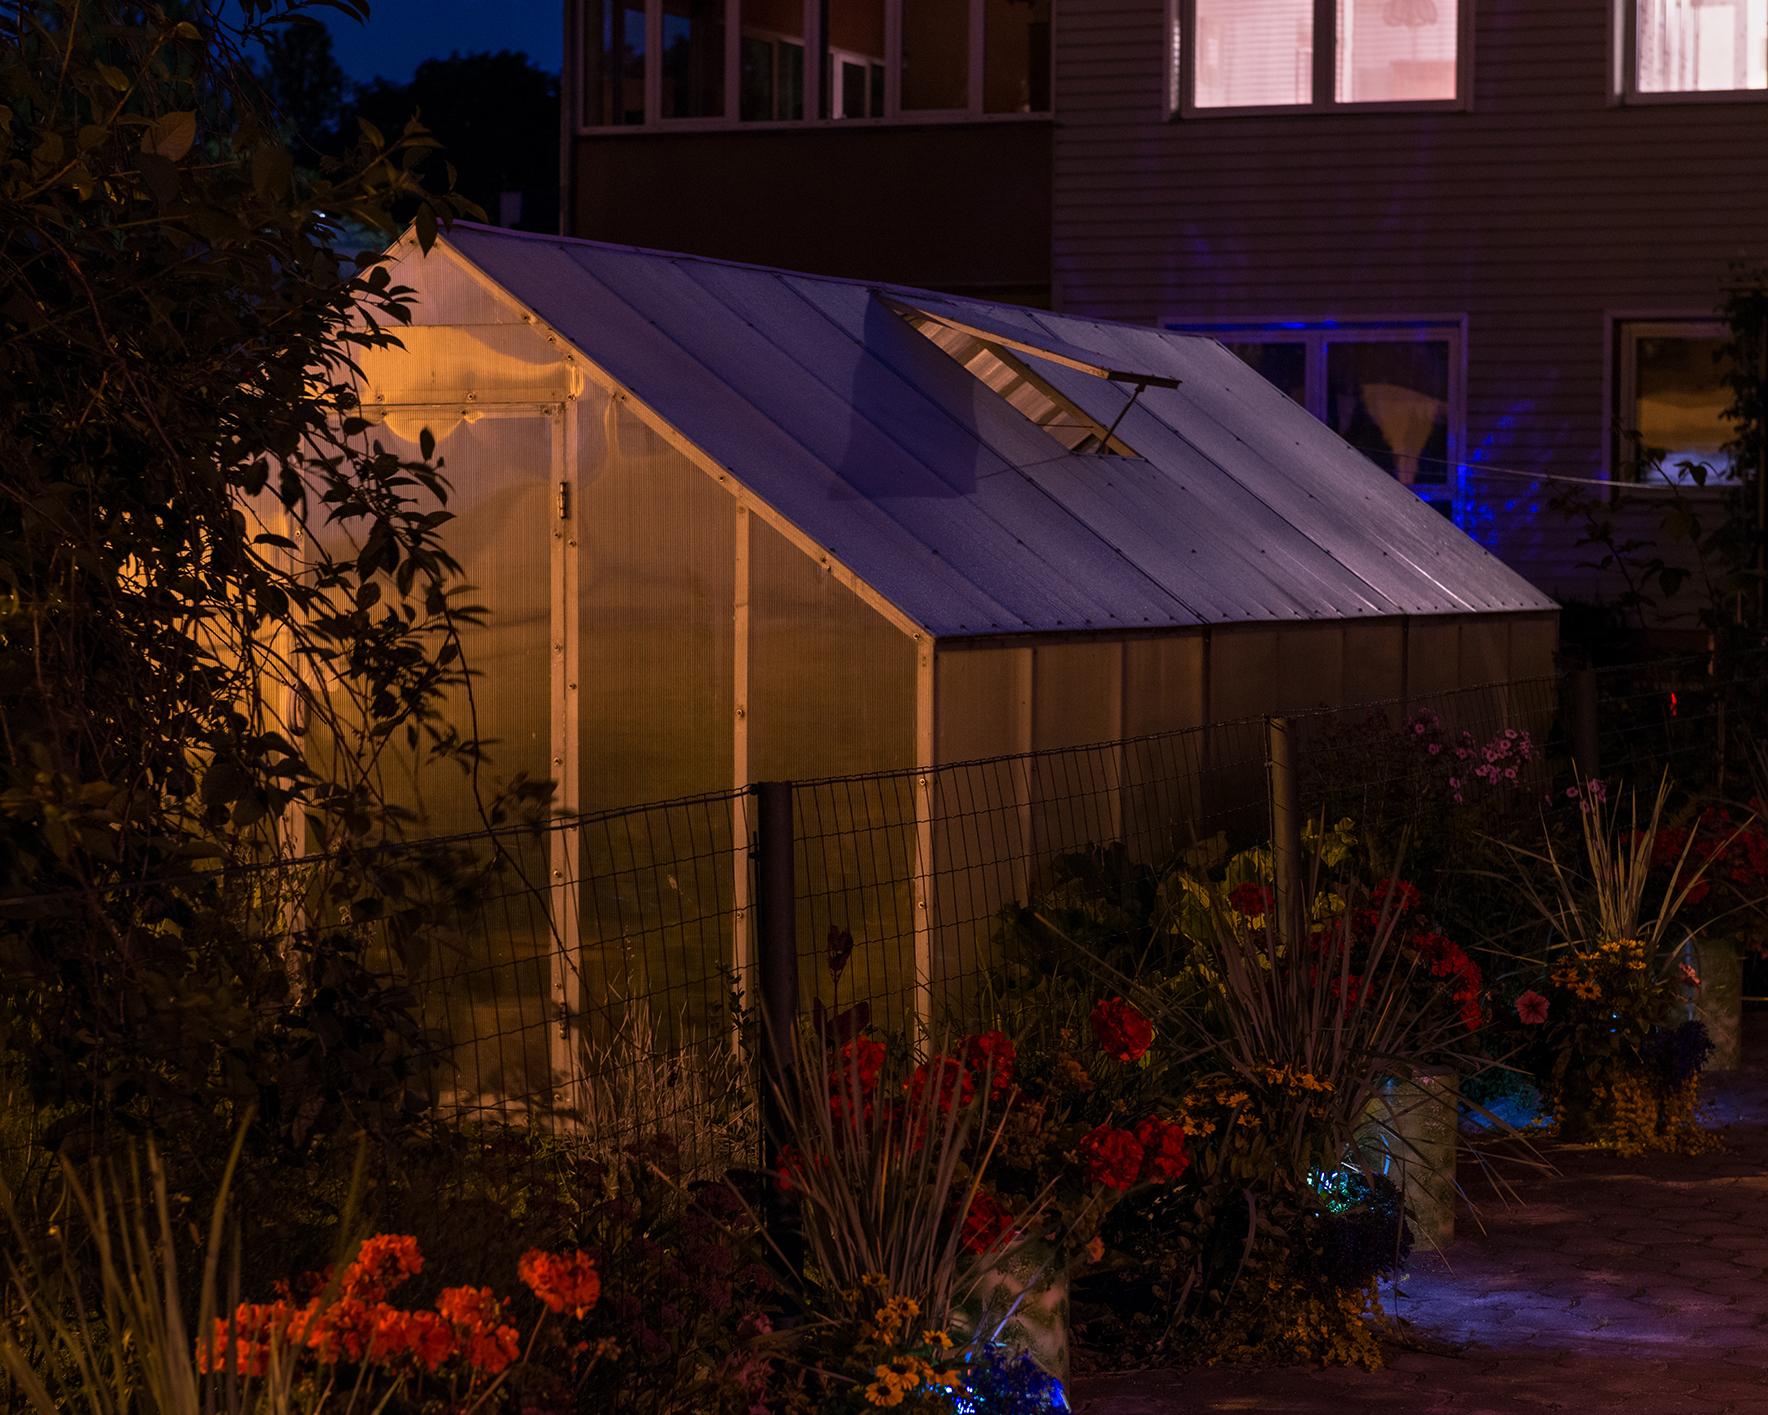 Greenhouse in a Garden